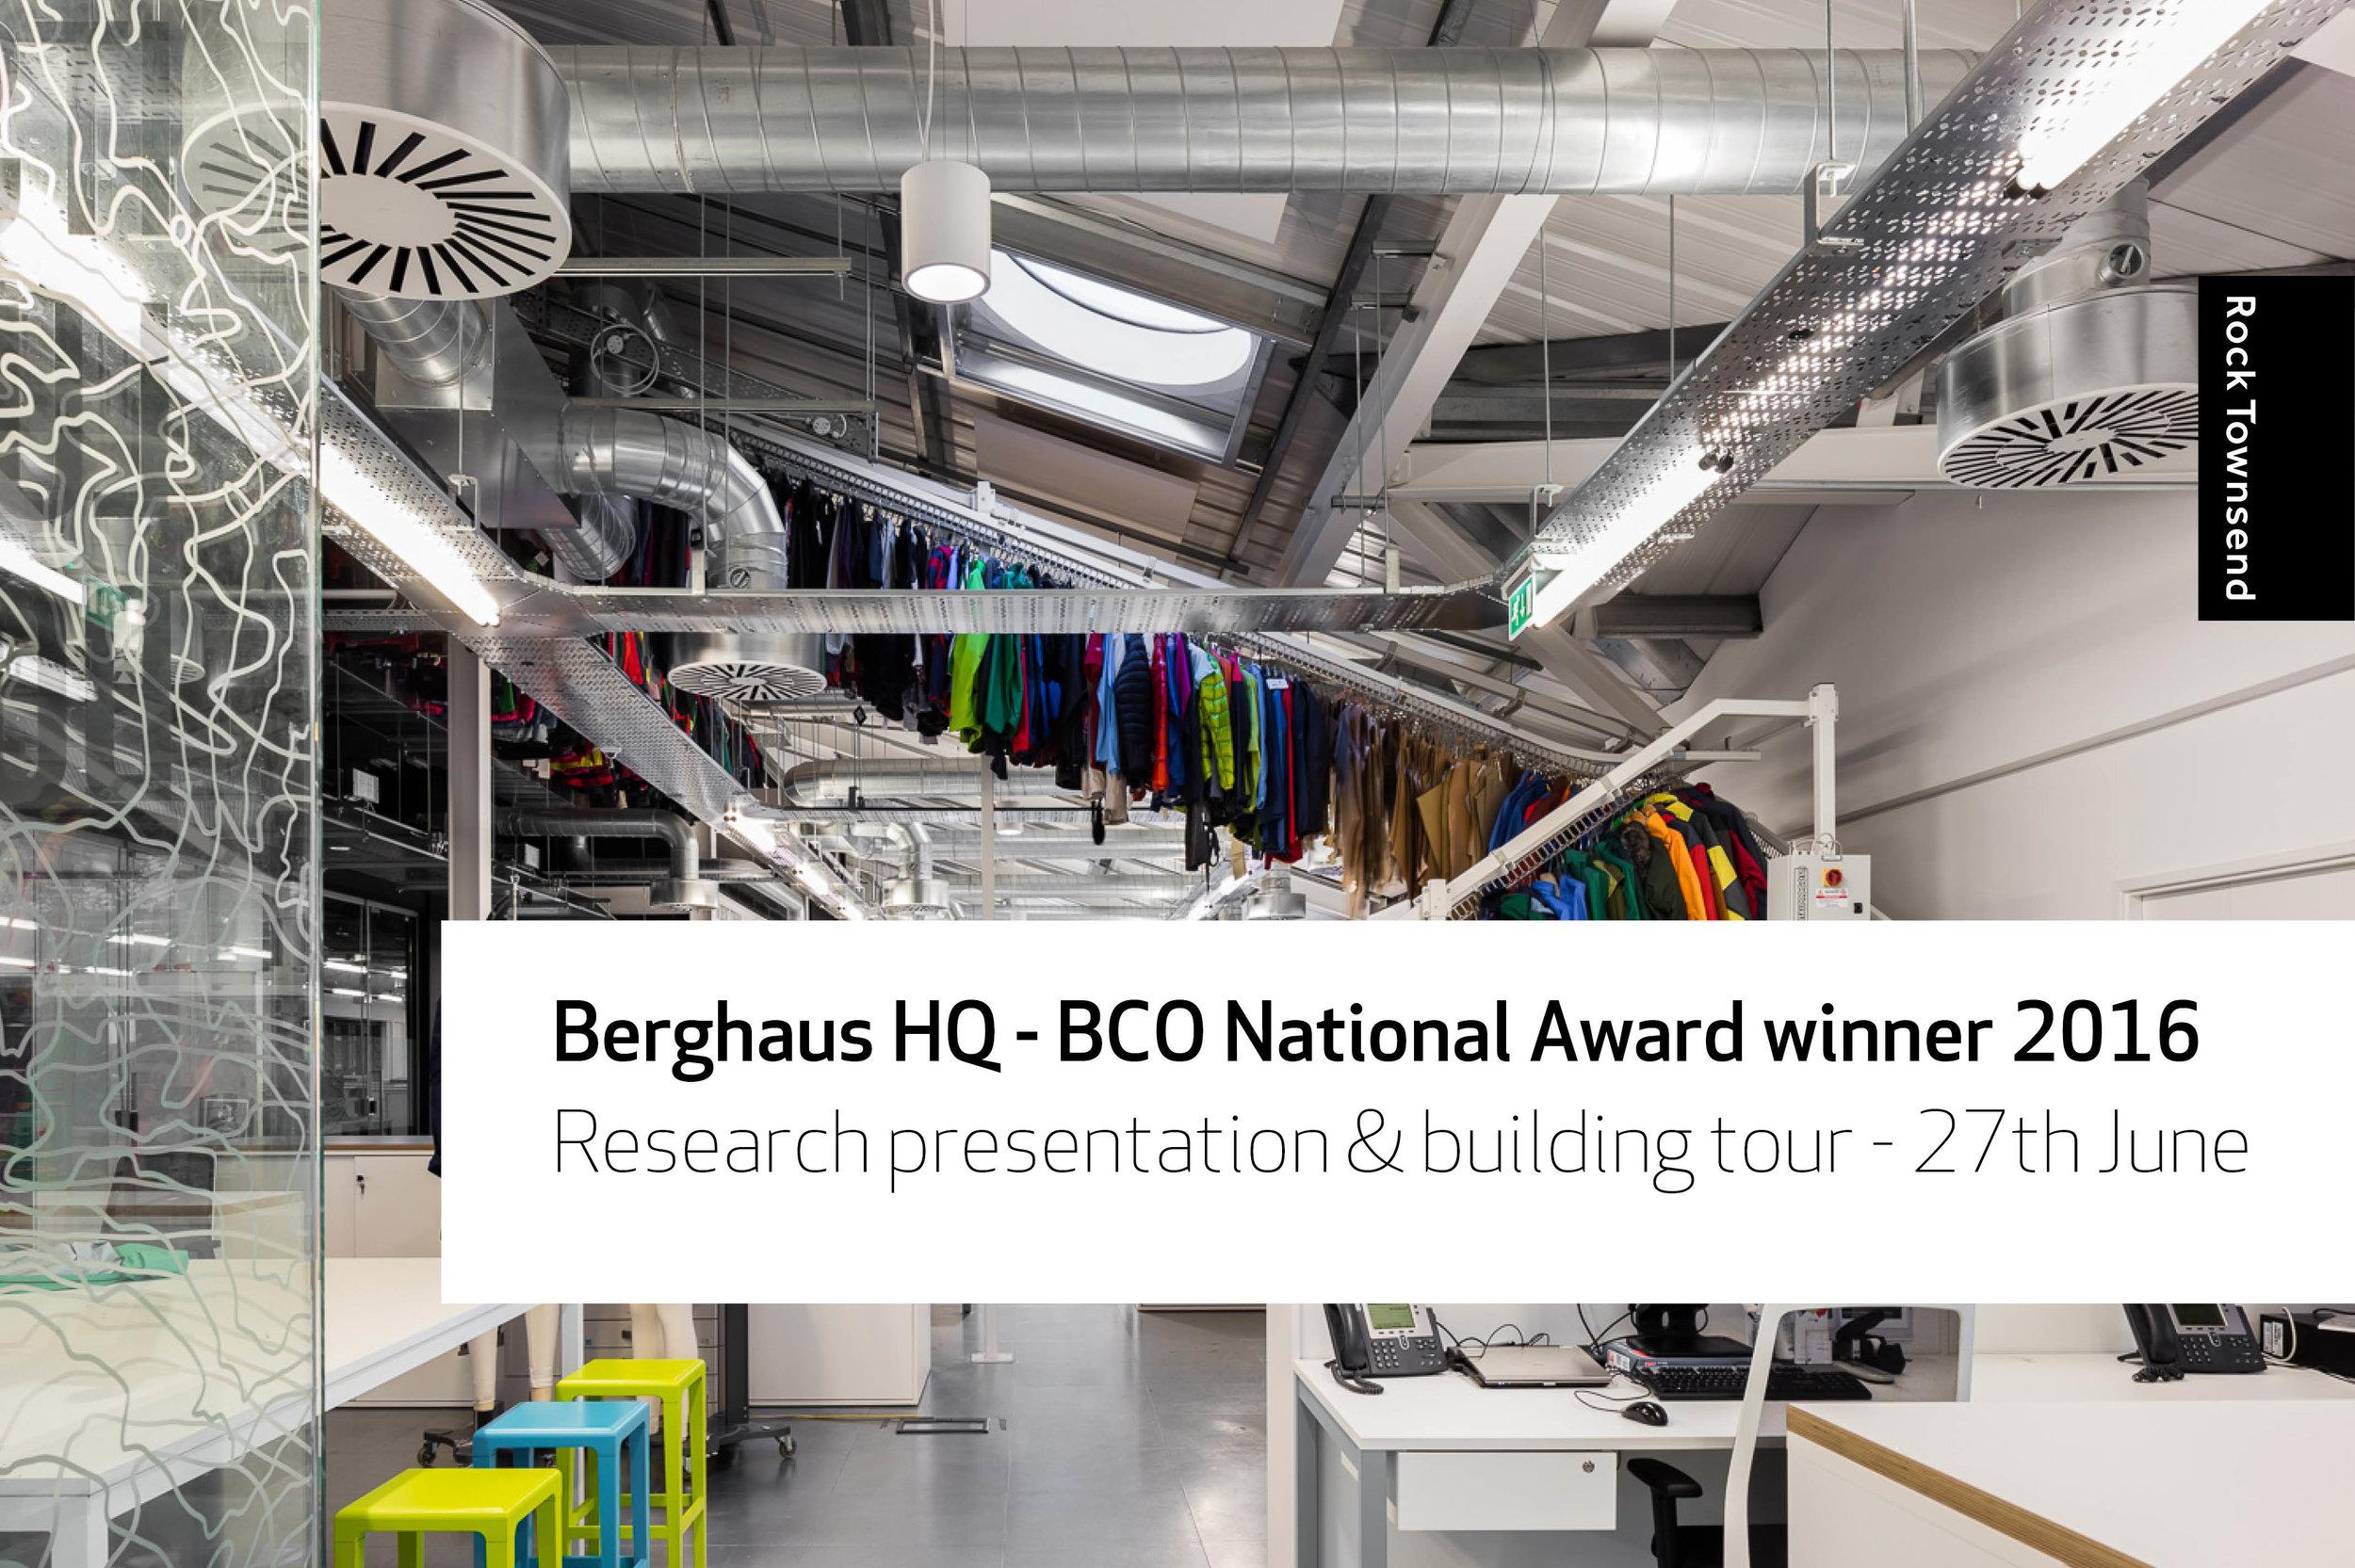 BCO_Berghaus_presentation+tour.jpg